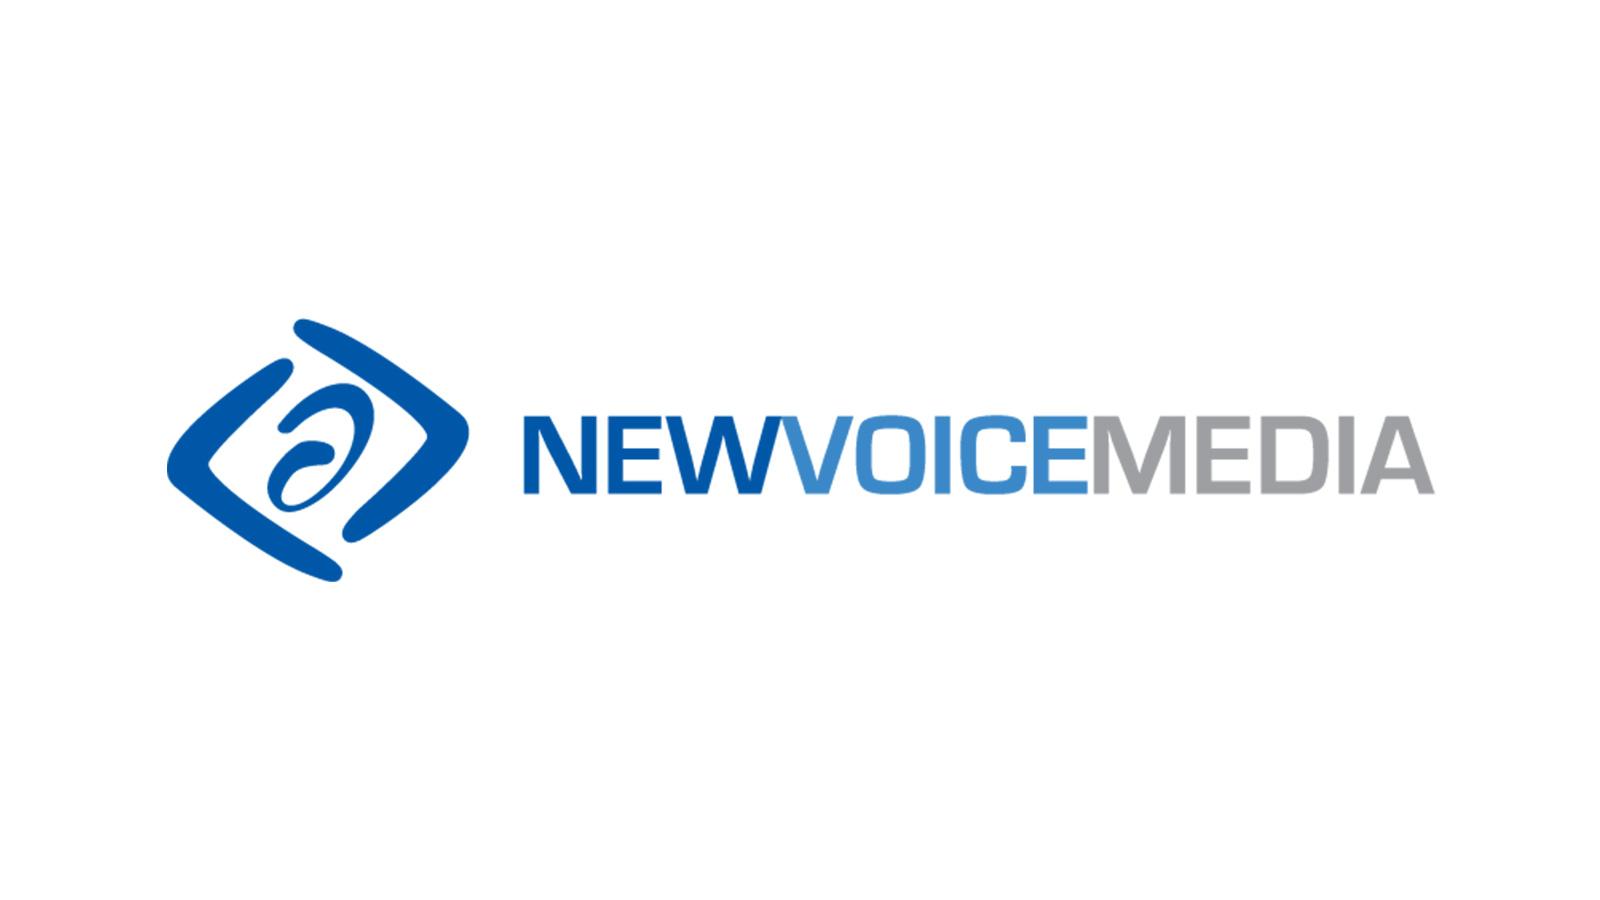 new-voice-media.jpg